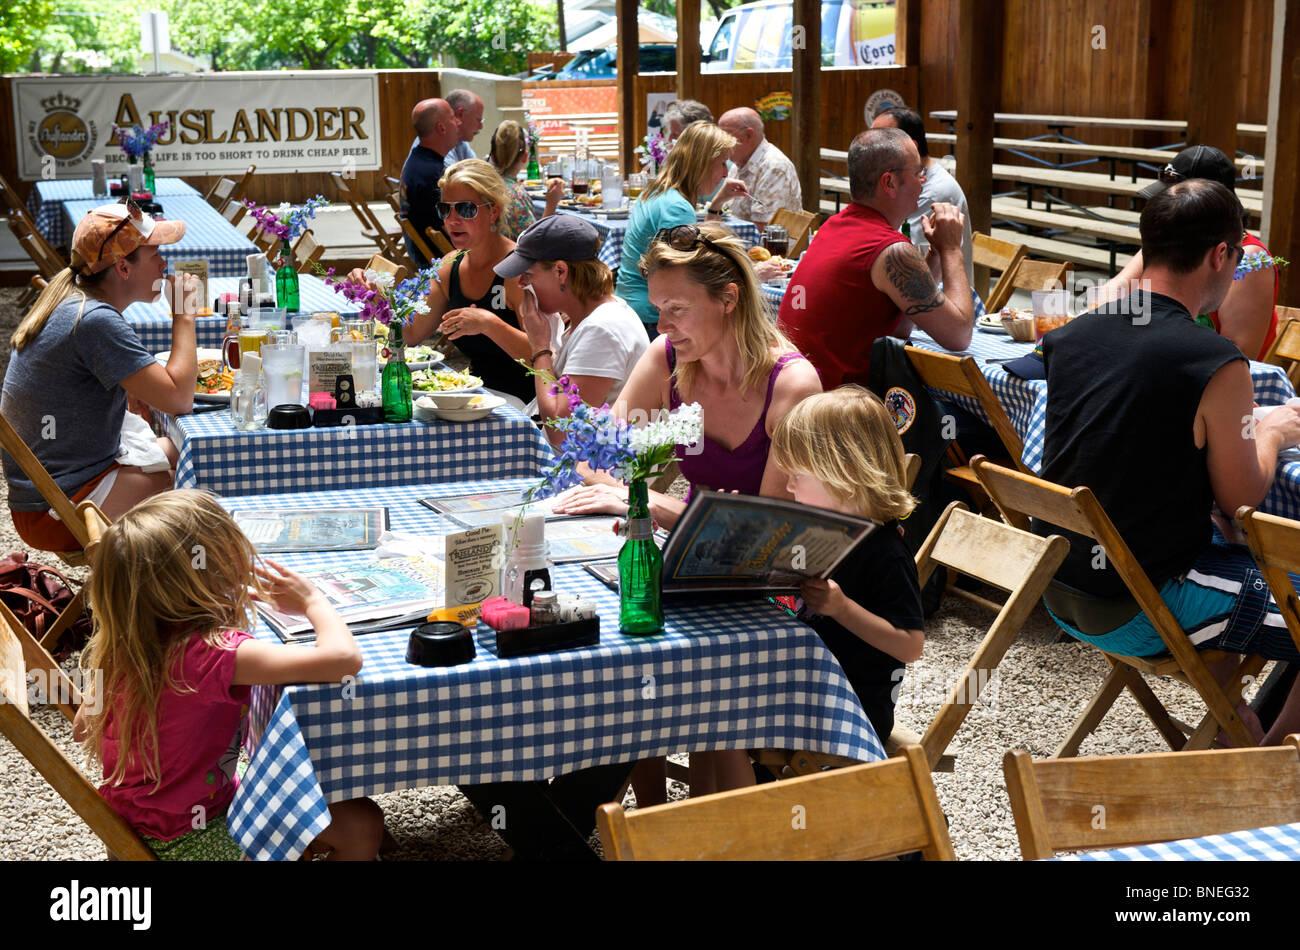 Auslander Restaurant Biergarten et Hill Country, Fredericksburg, au Texas, USA Banque D'Images